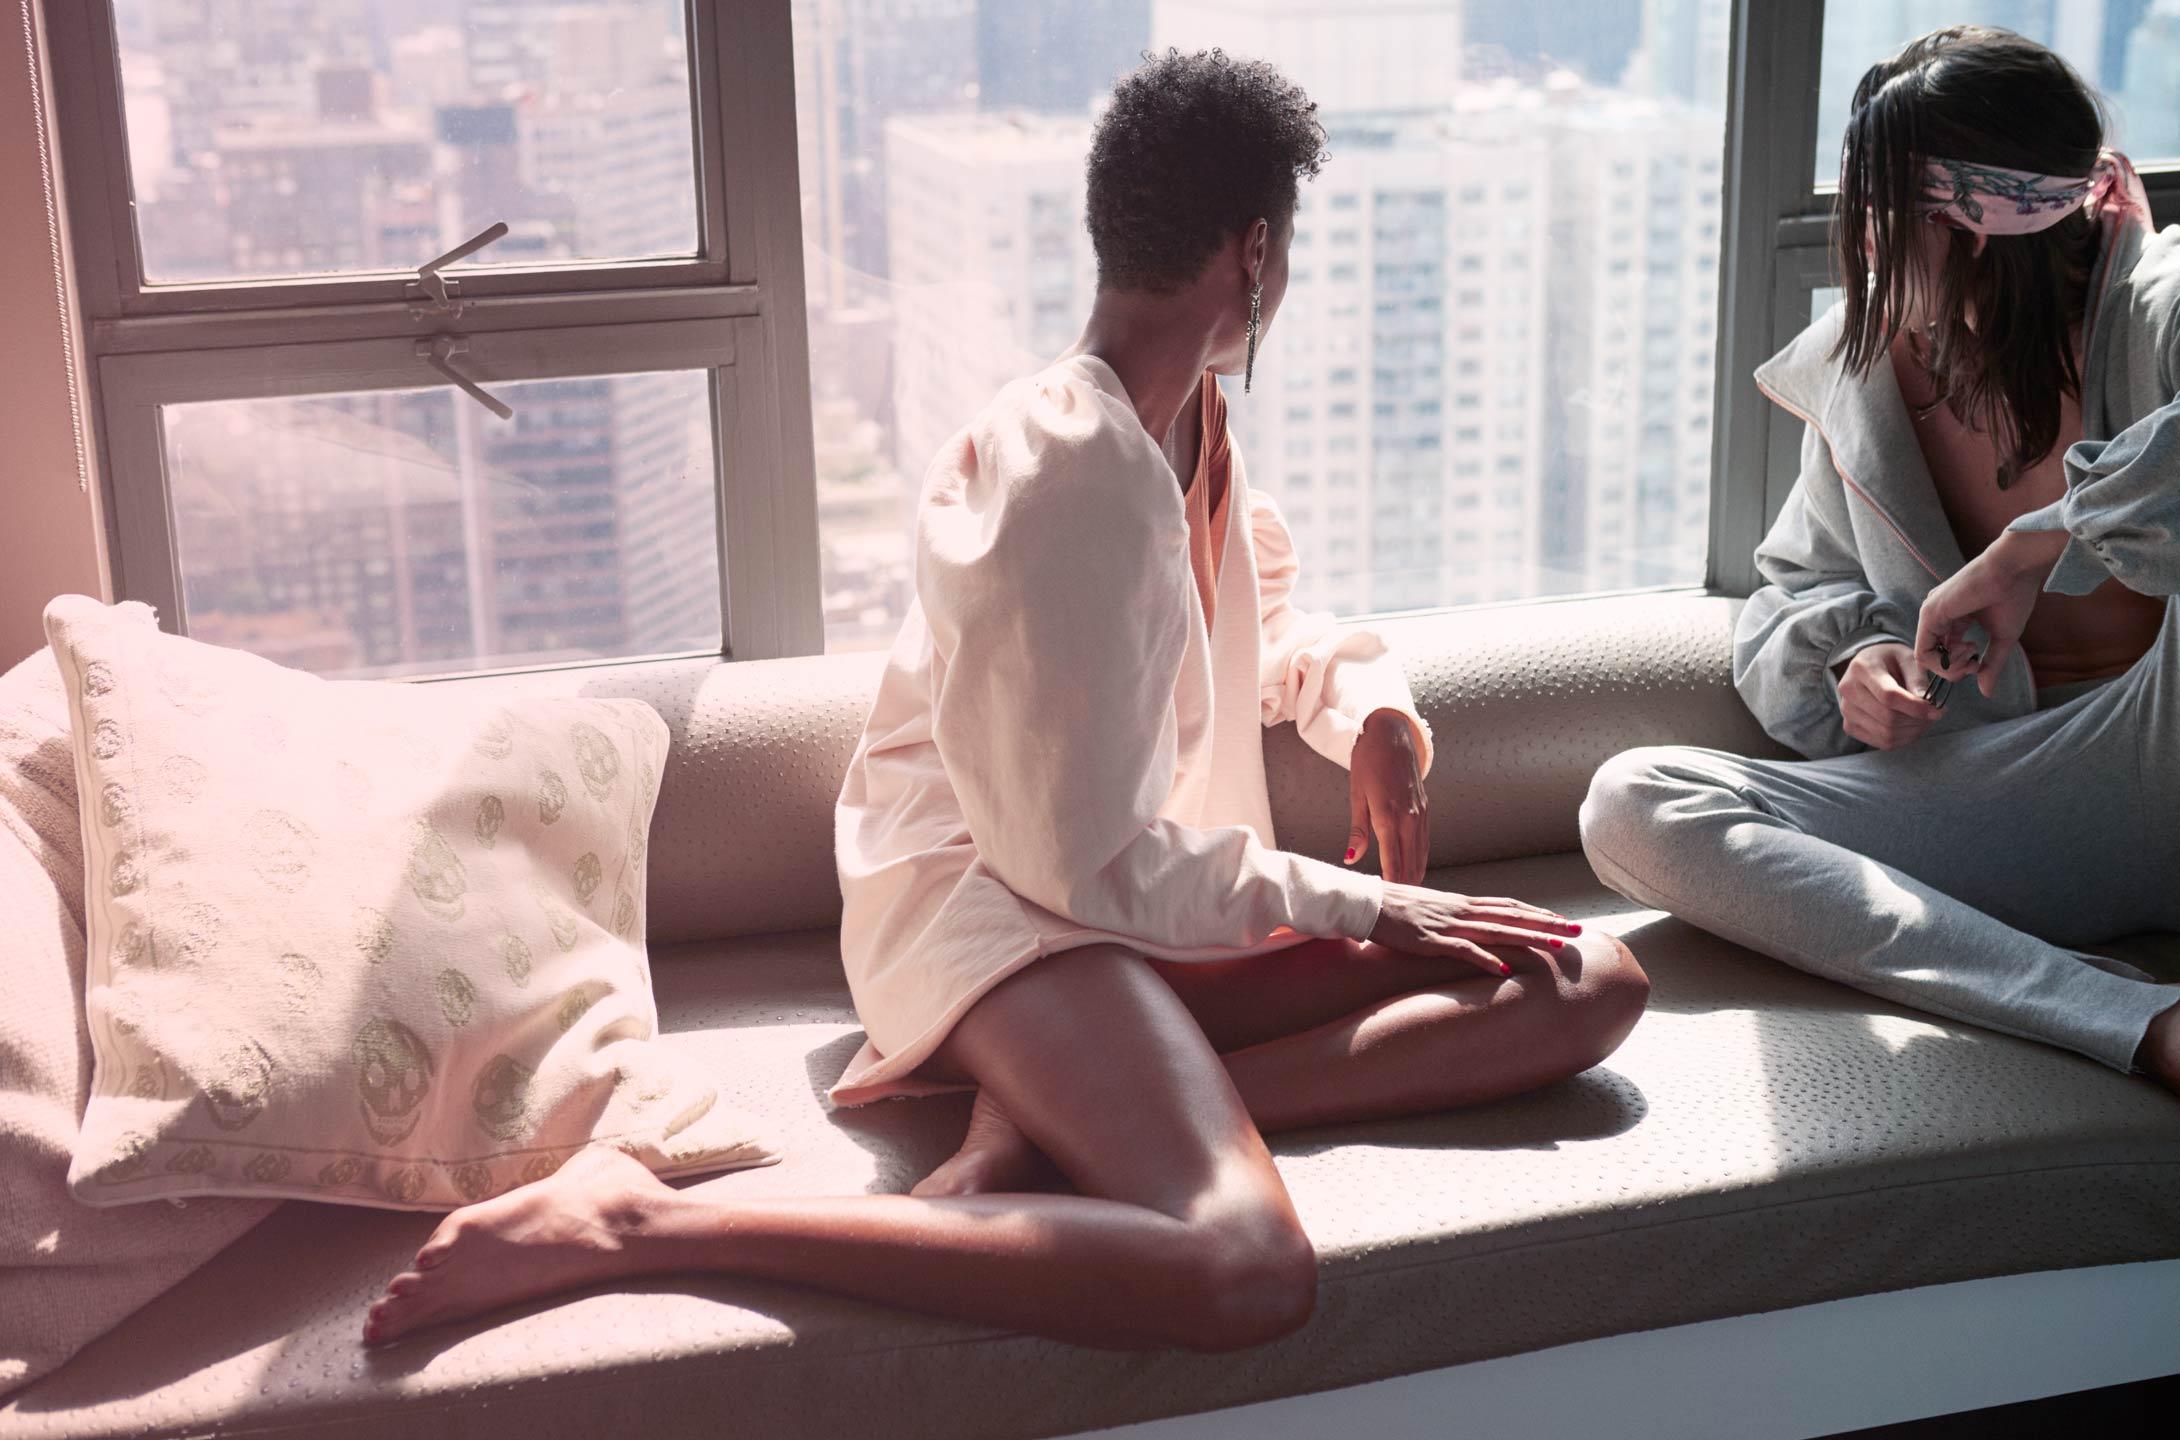 Fashion Campaign for Philistine I Greg Sorensen I Fashion & Beauty Photographer I NYC